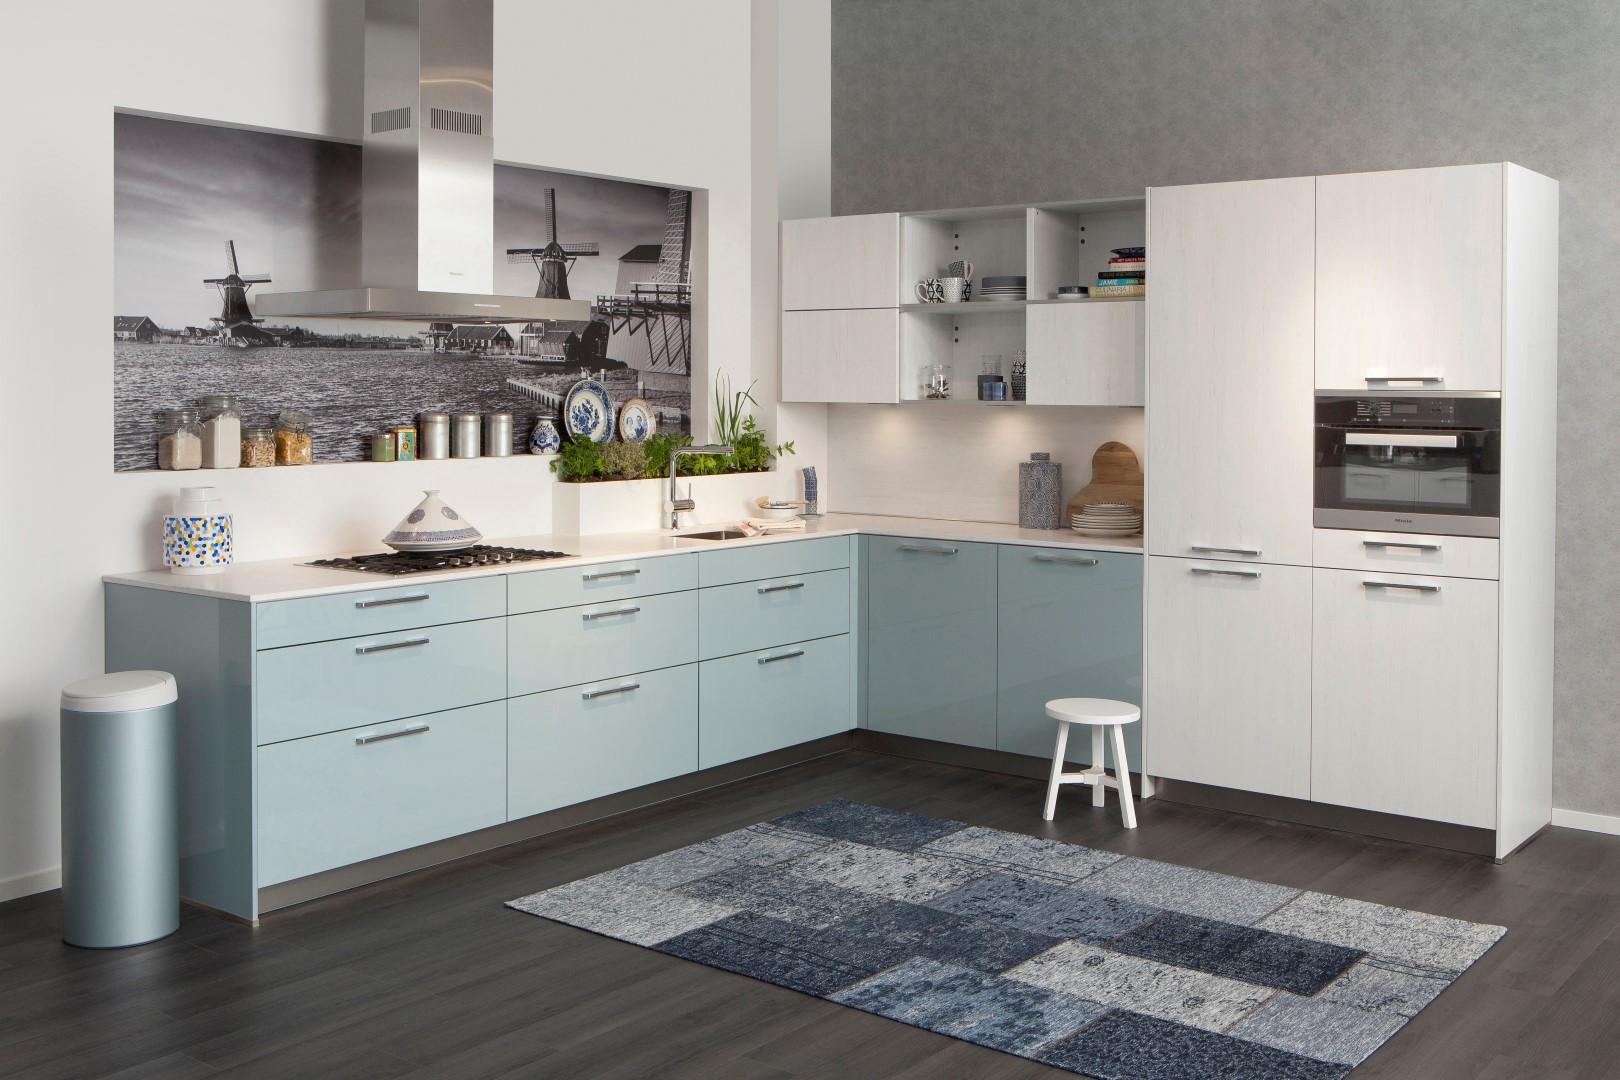 Moderne hoekkeuken keukenkampioen